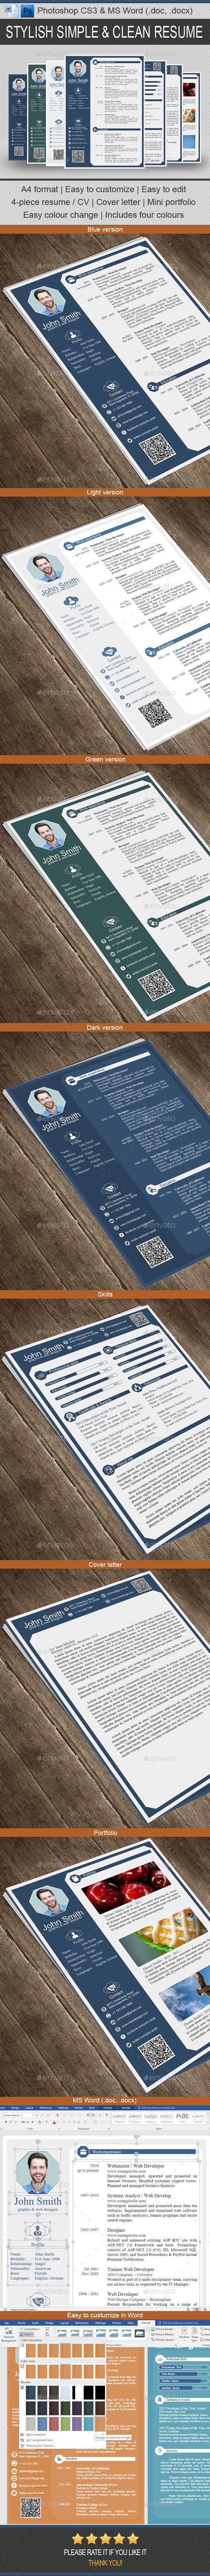 Professional Resume / CV Template PSD. Download here: http://graphicriver.net/item/professional-resume-cv/14882309?ref=ksioks